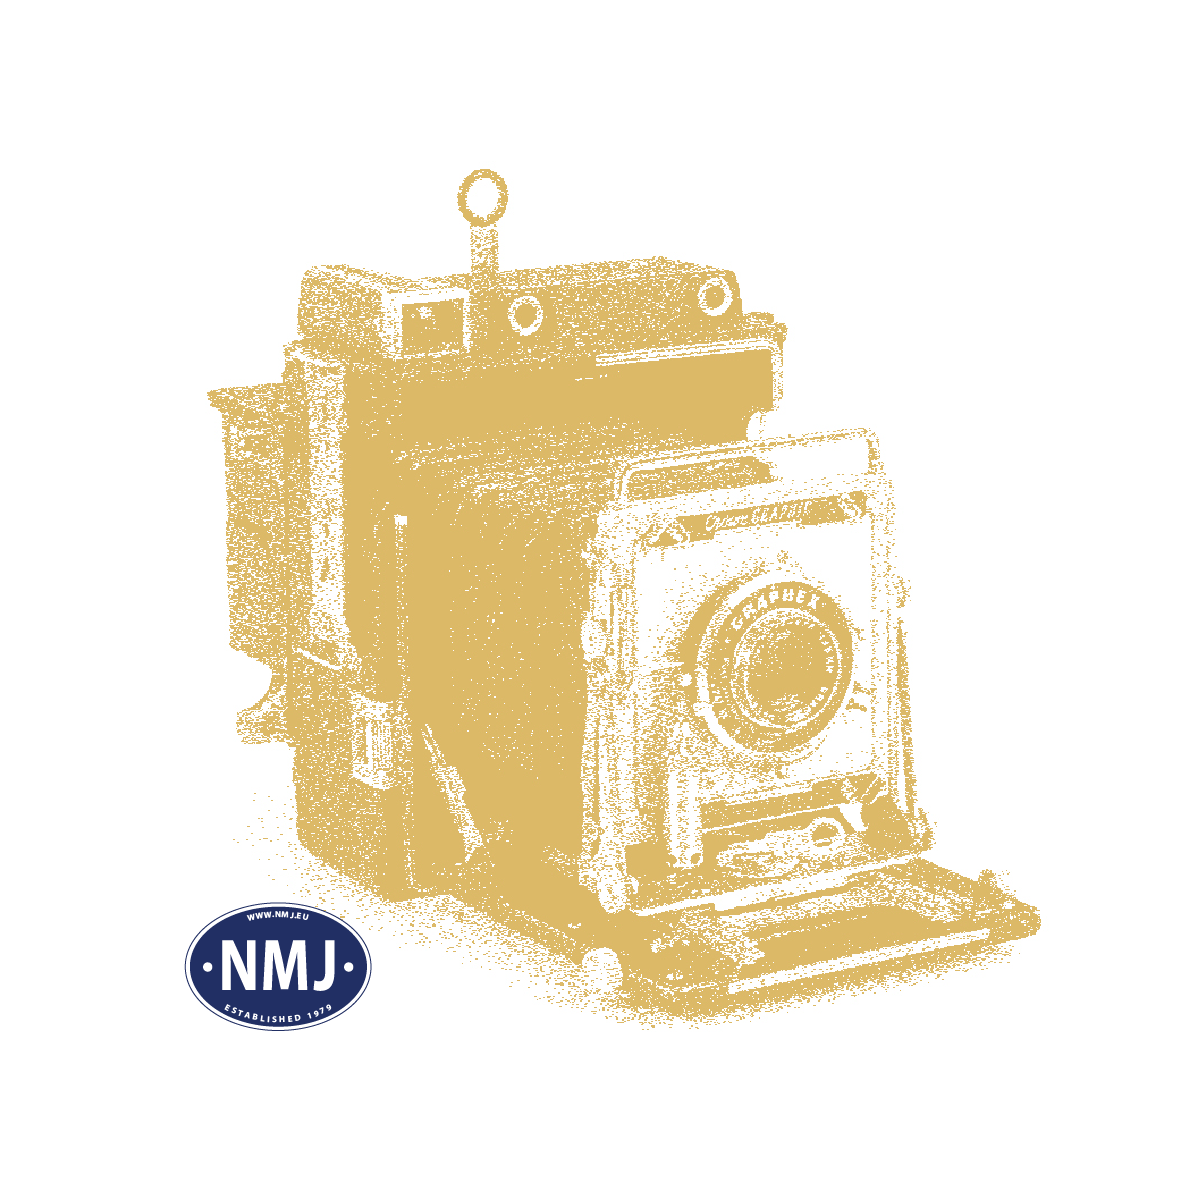 NMJT101.304 - NMJ Topline NSB WLABK 21080 Red/Black livery